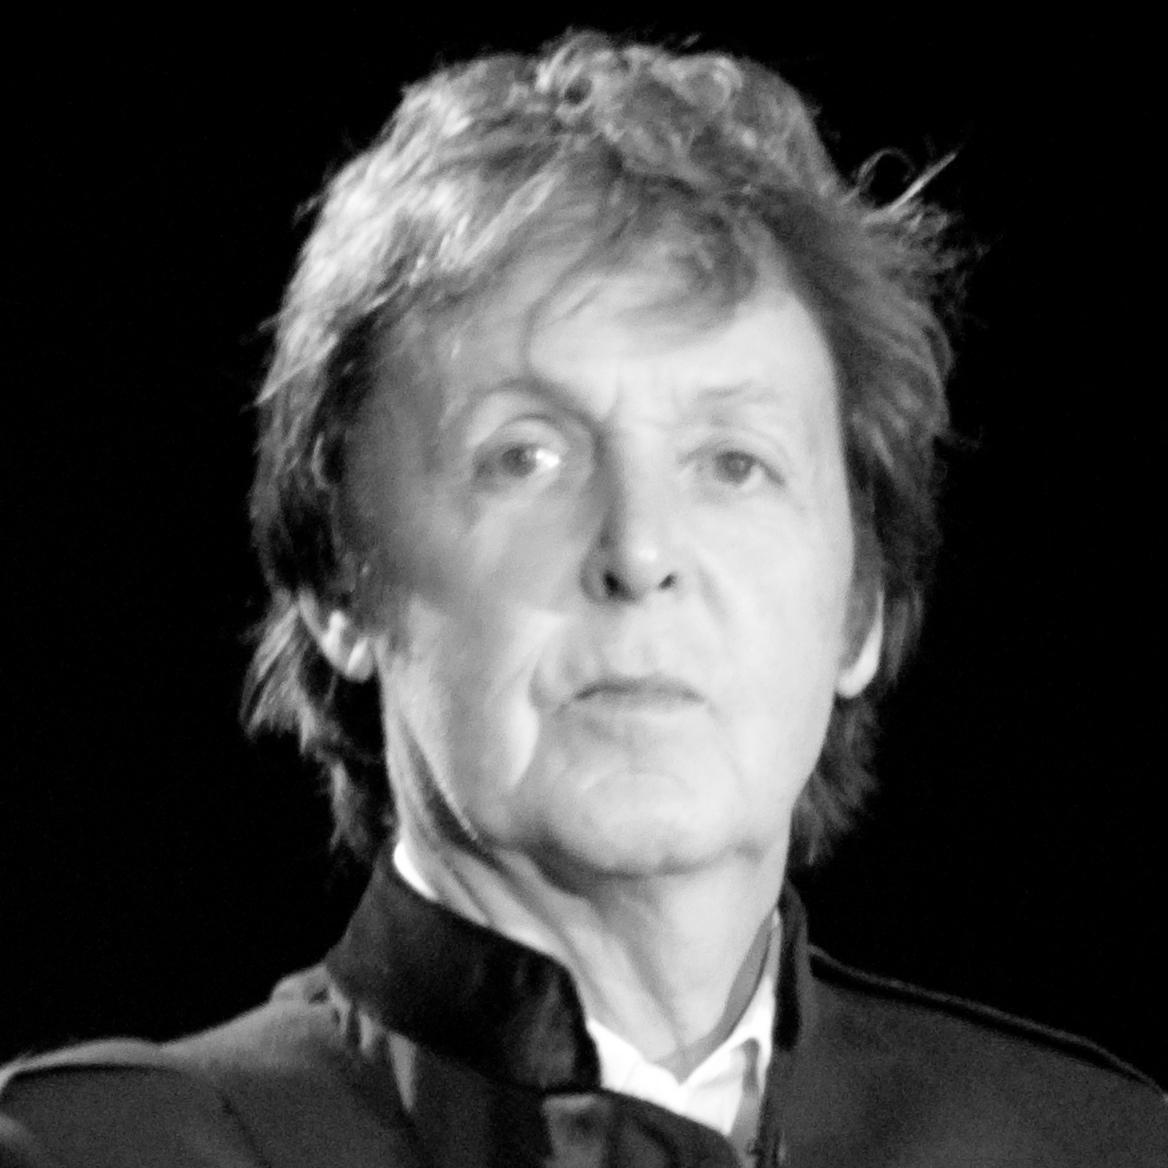 Paul McCartney Bio, Net Worth, Facts